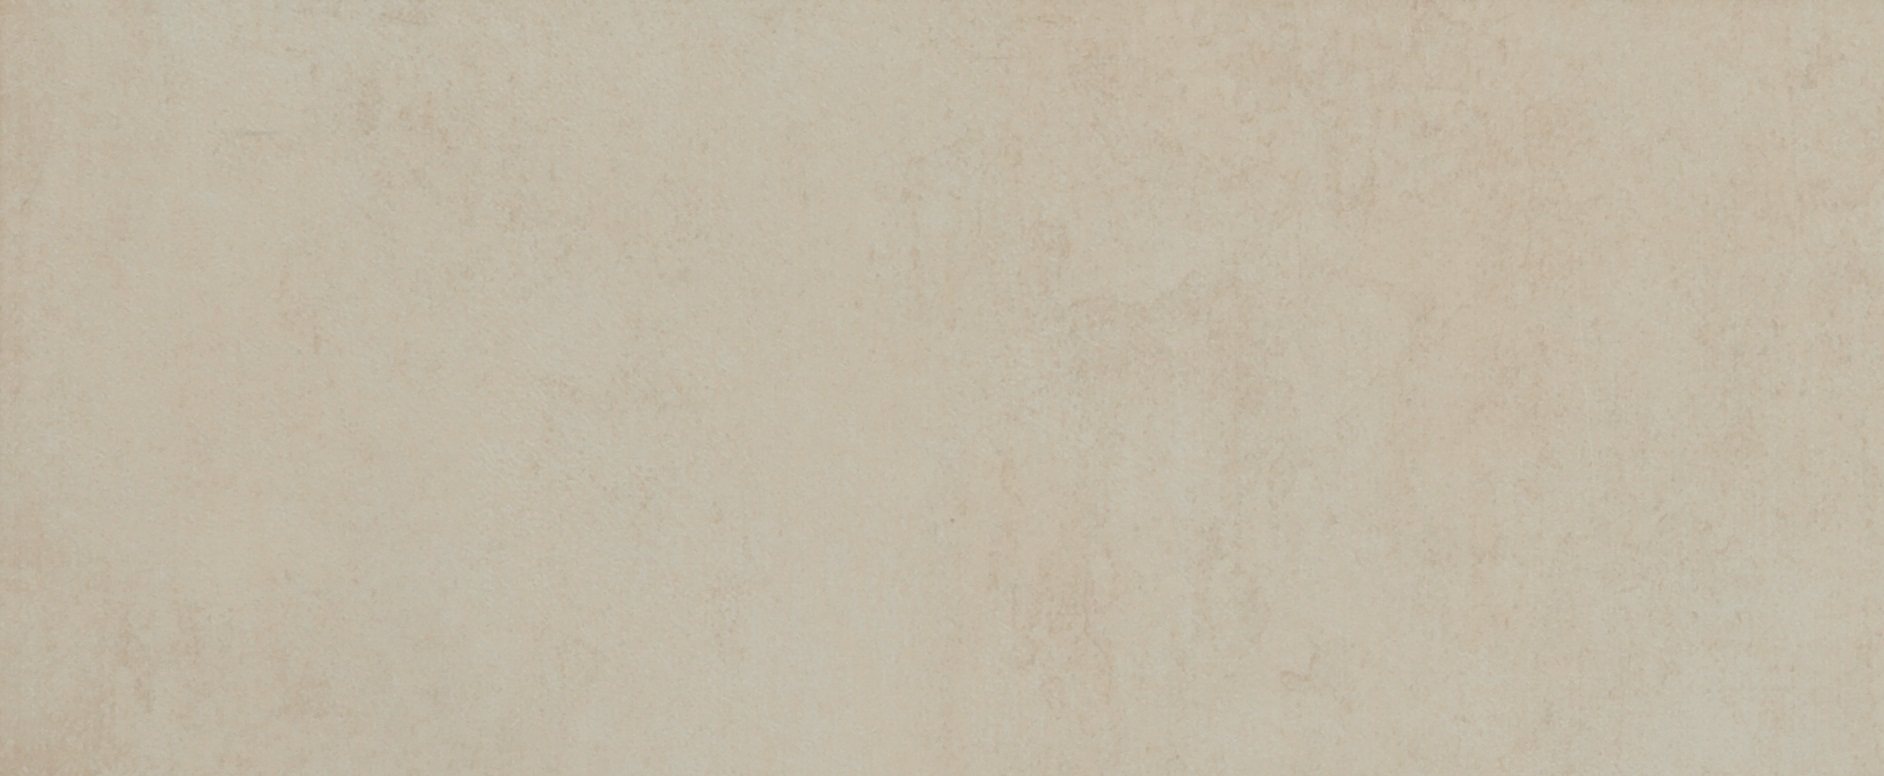 04 Logic crema 20x60 - Hansas Plaadimaailm